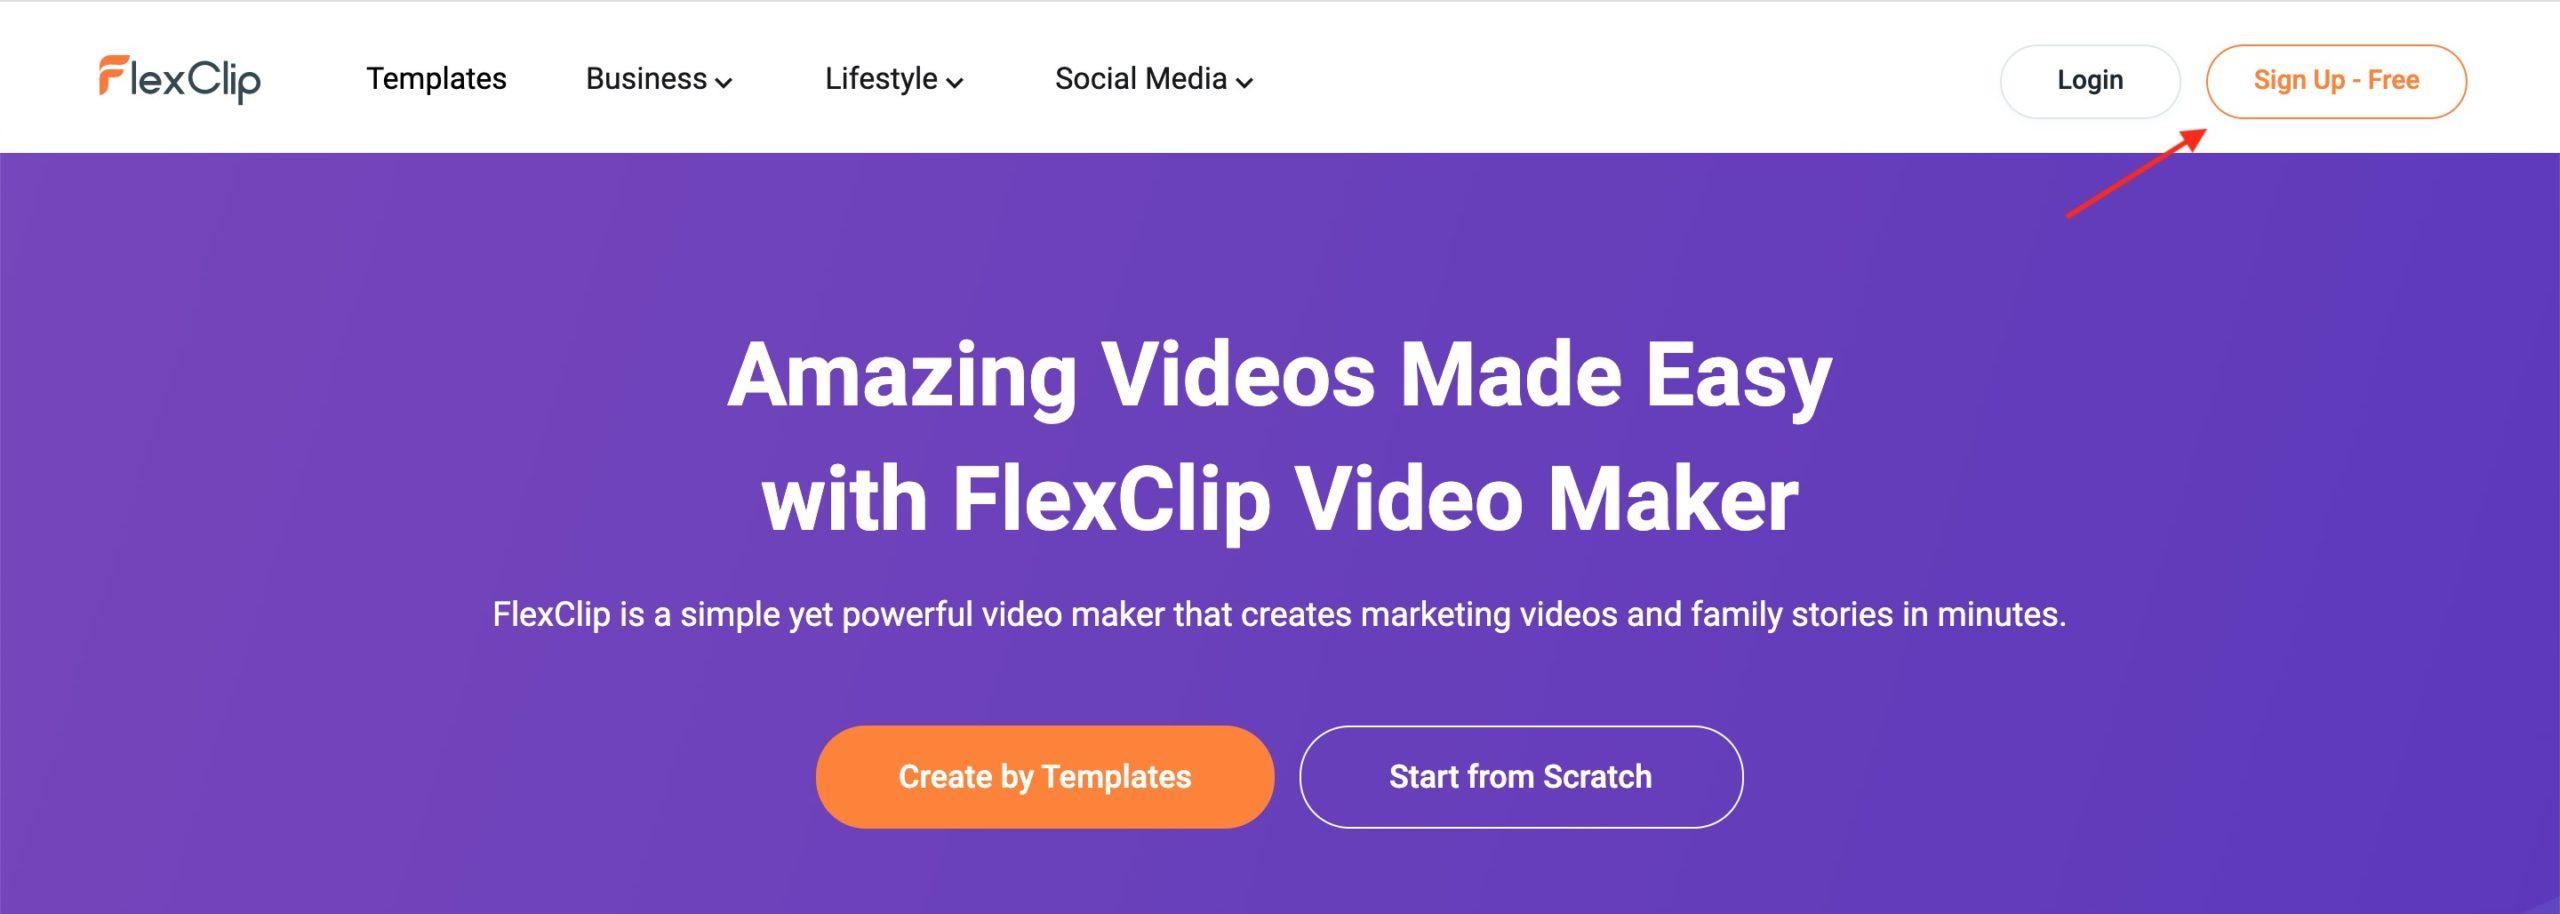 FlexClip scaled